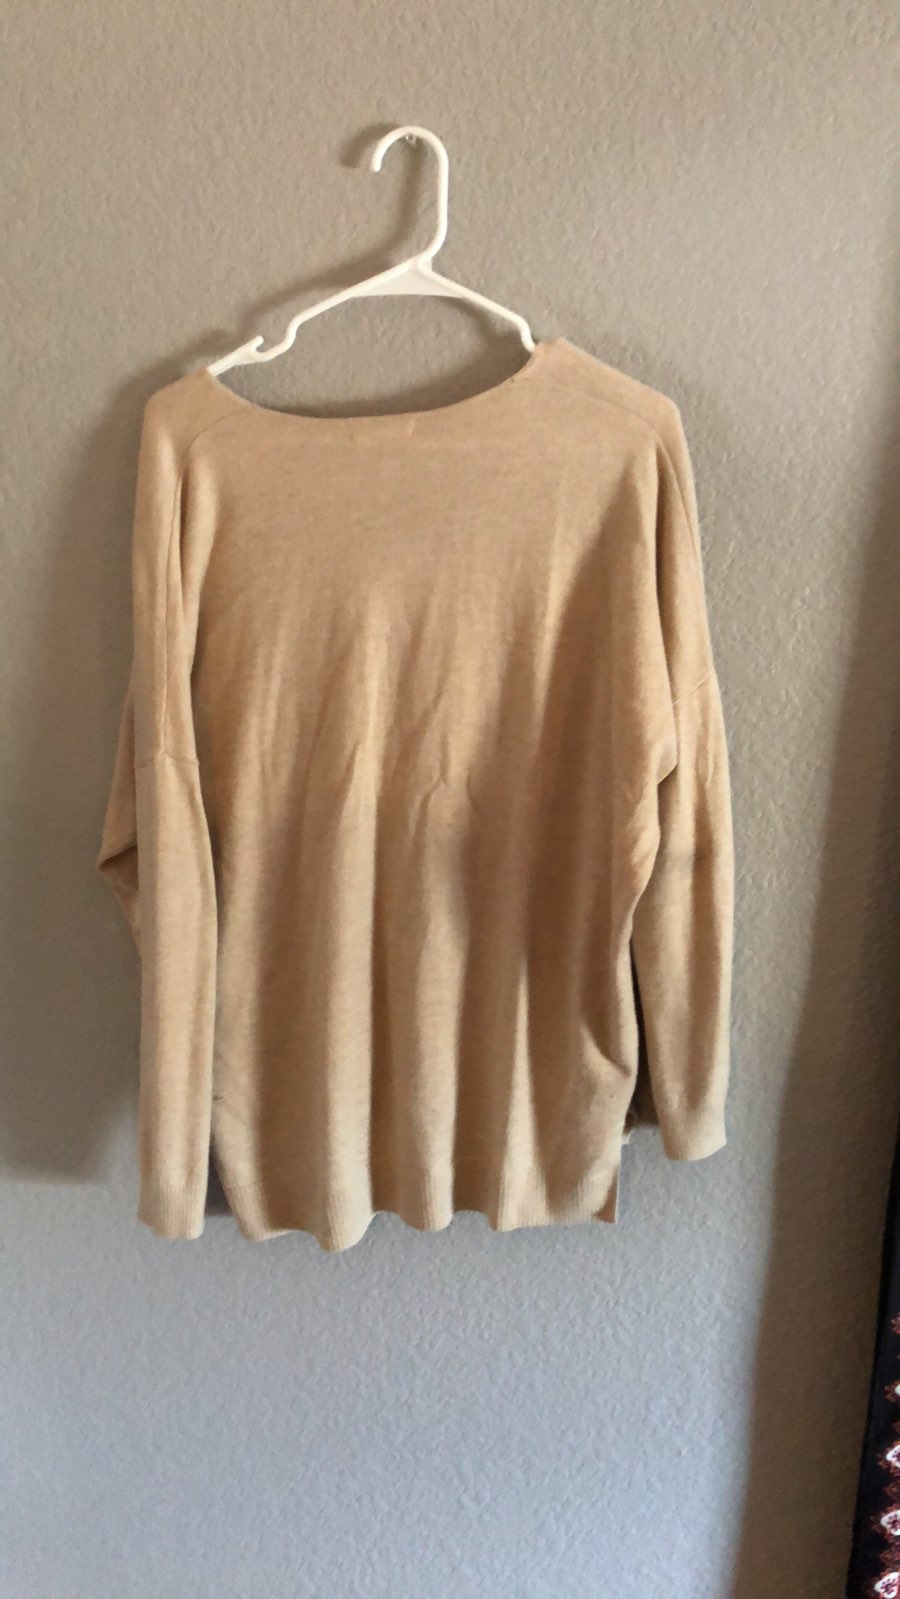 Light tan sweater - Mercari: BUY & SELL THINGS YOU LOVE